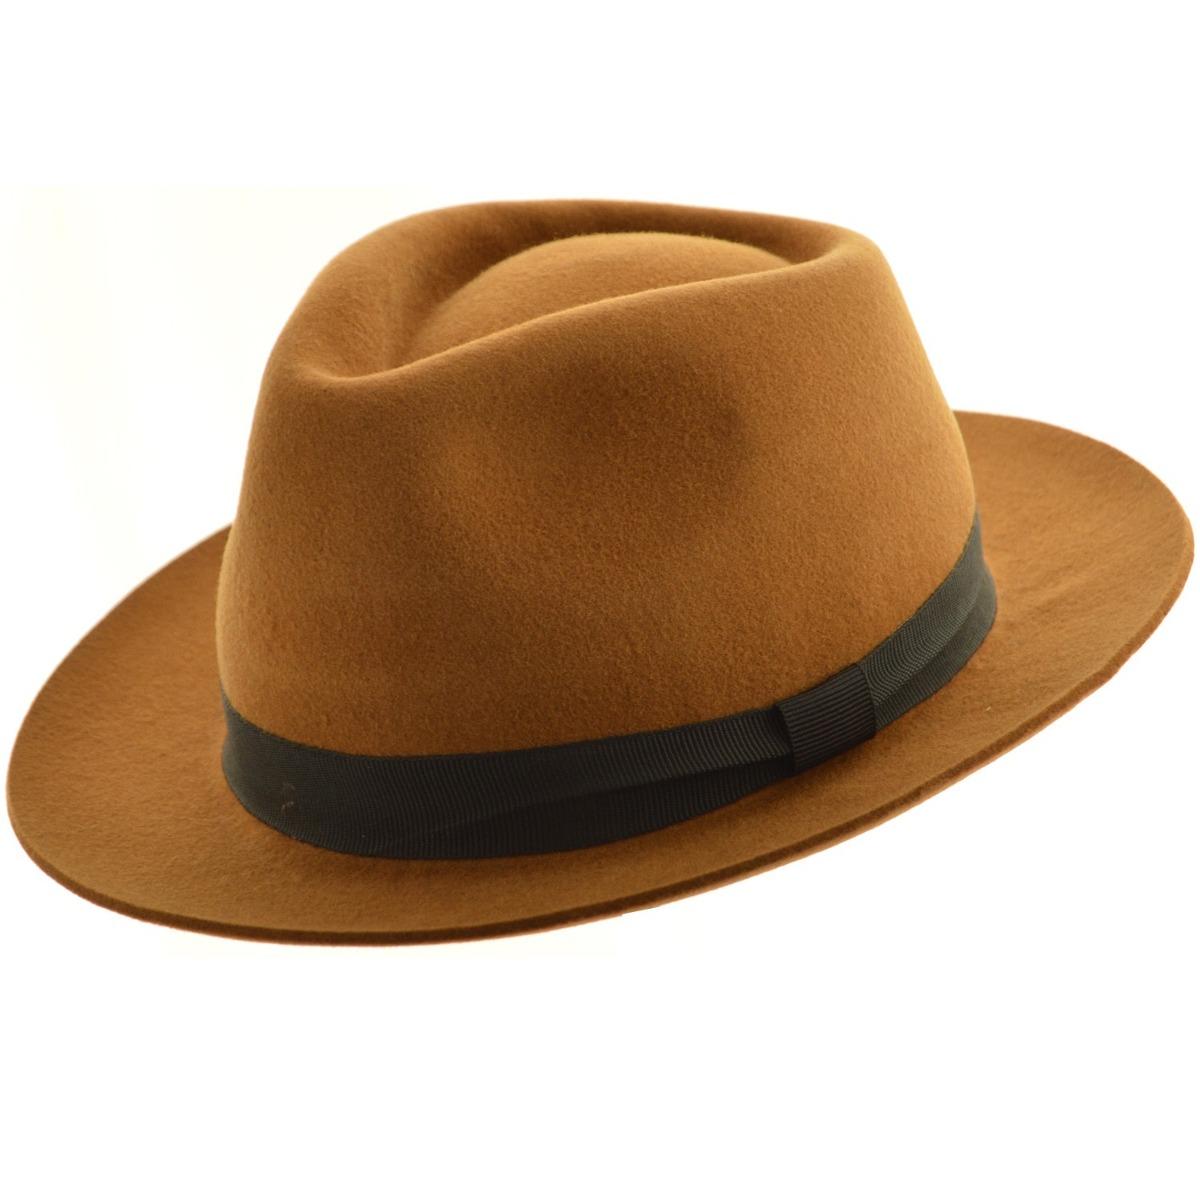 3b73ae3e42075 sombrero de fieltro vincent compañia de sombreros h71401090. Cargando zoom.